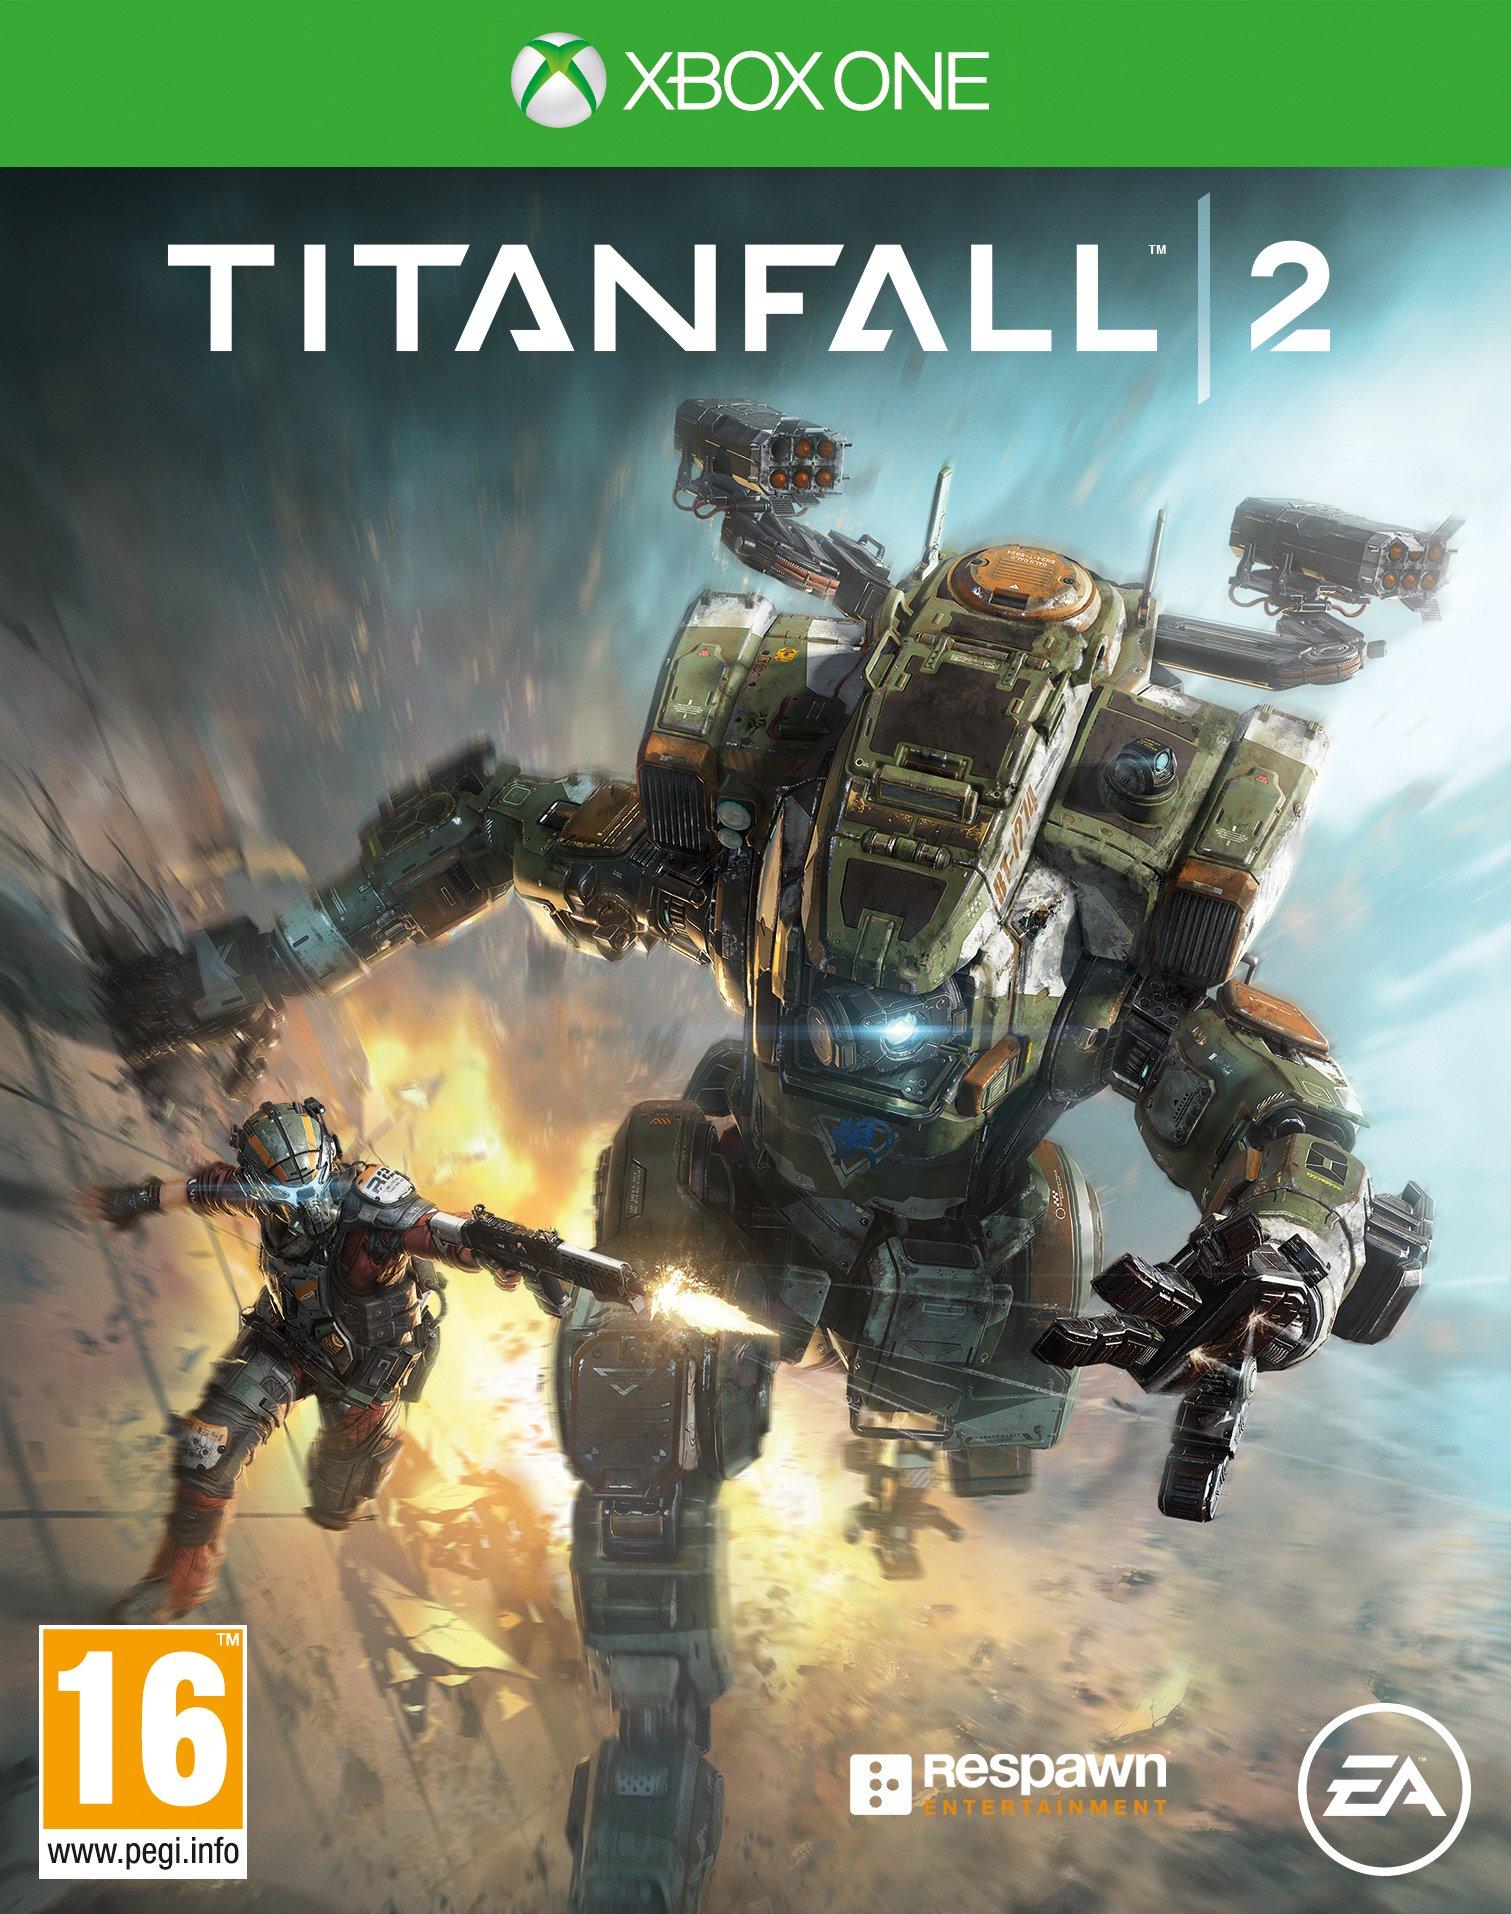 Titanfall 2 (Xbox One) product image